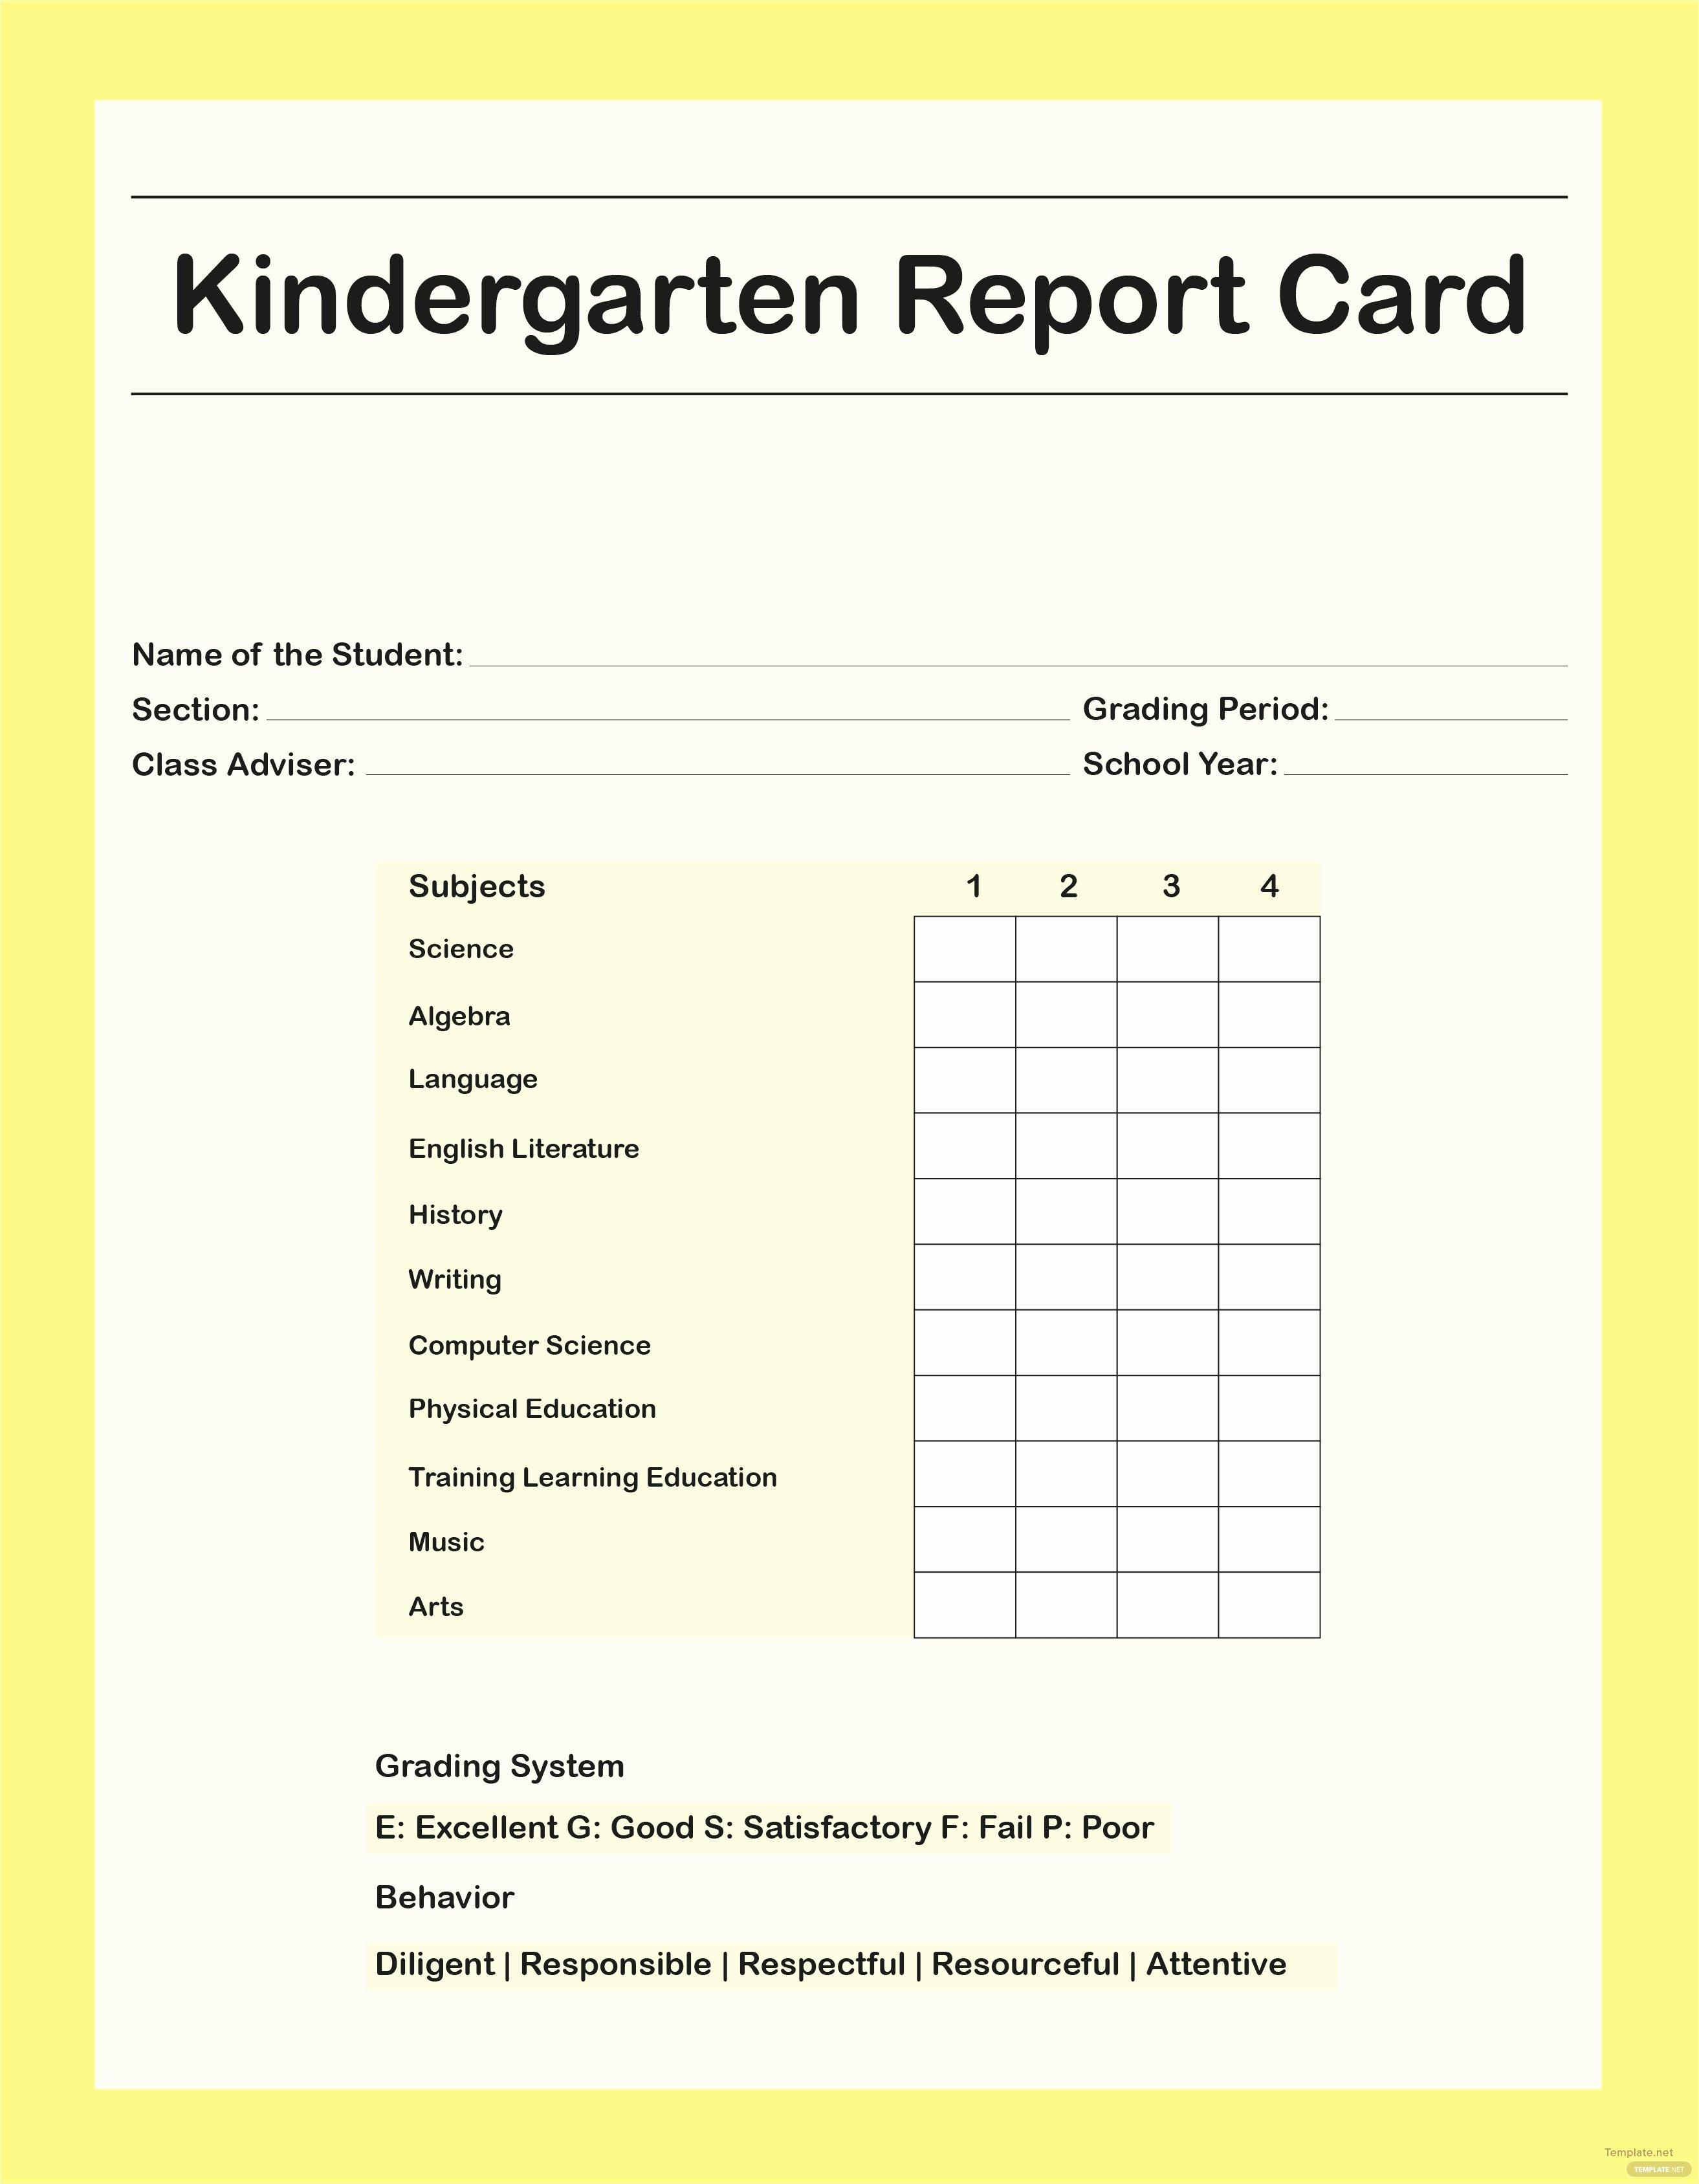 Preschool Report Card Template Unique Free Kindergarten Report Card Template In Adobe Shop